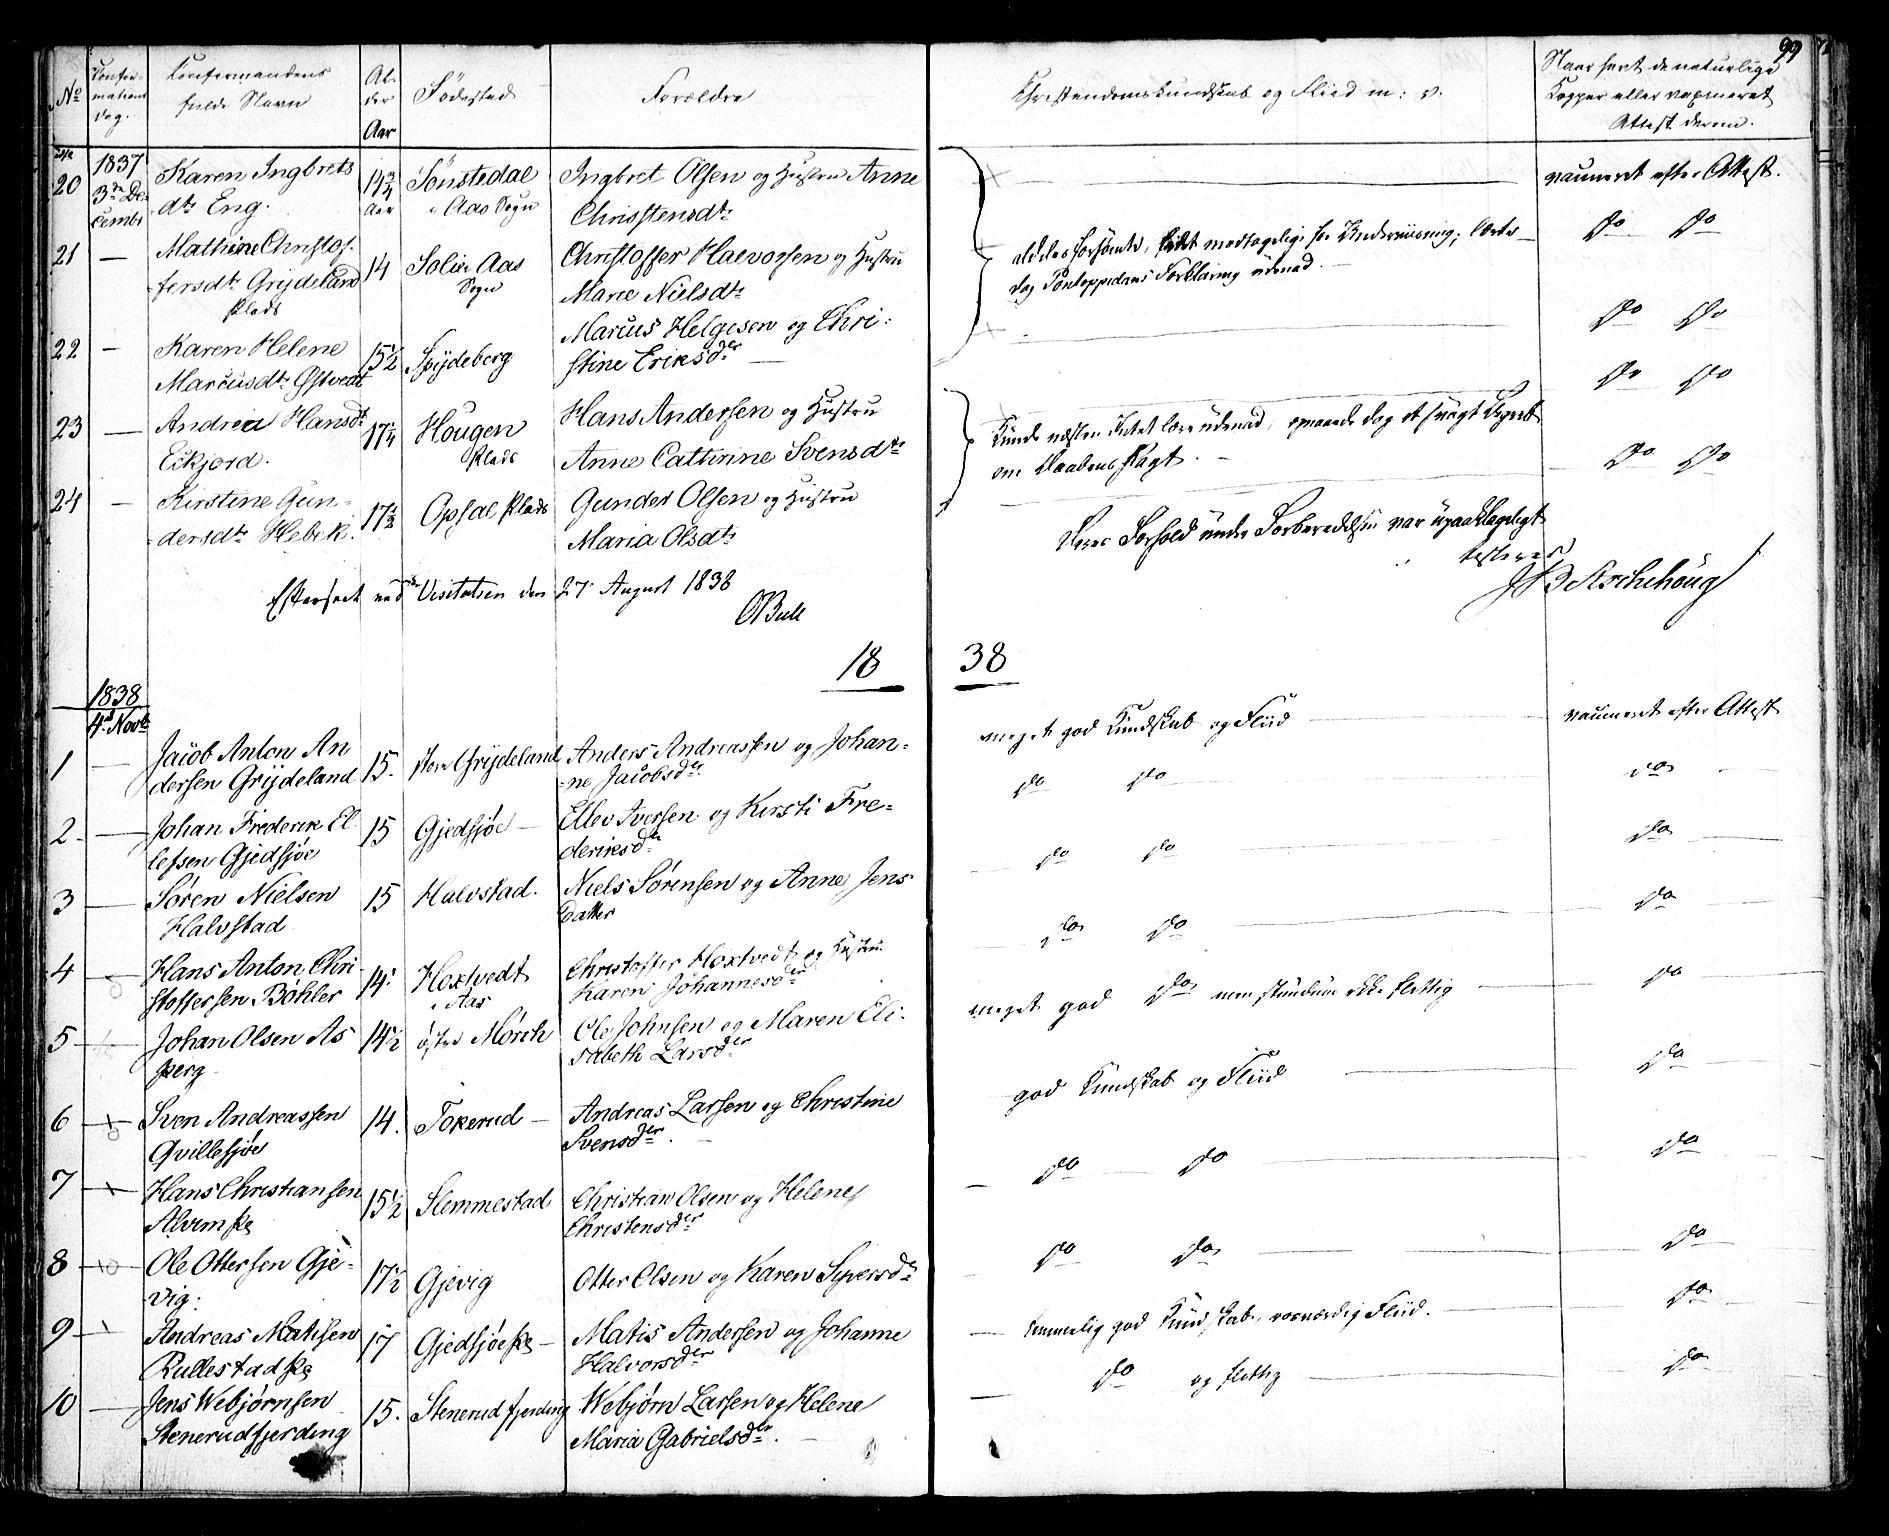 SAO, Kråkstad prestekontor Kirkebøker, F/Fa/L0005: Ministerialbok nr. I 5, 1837-1847, s. 99